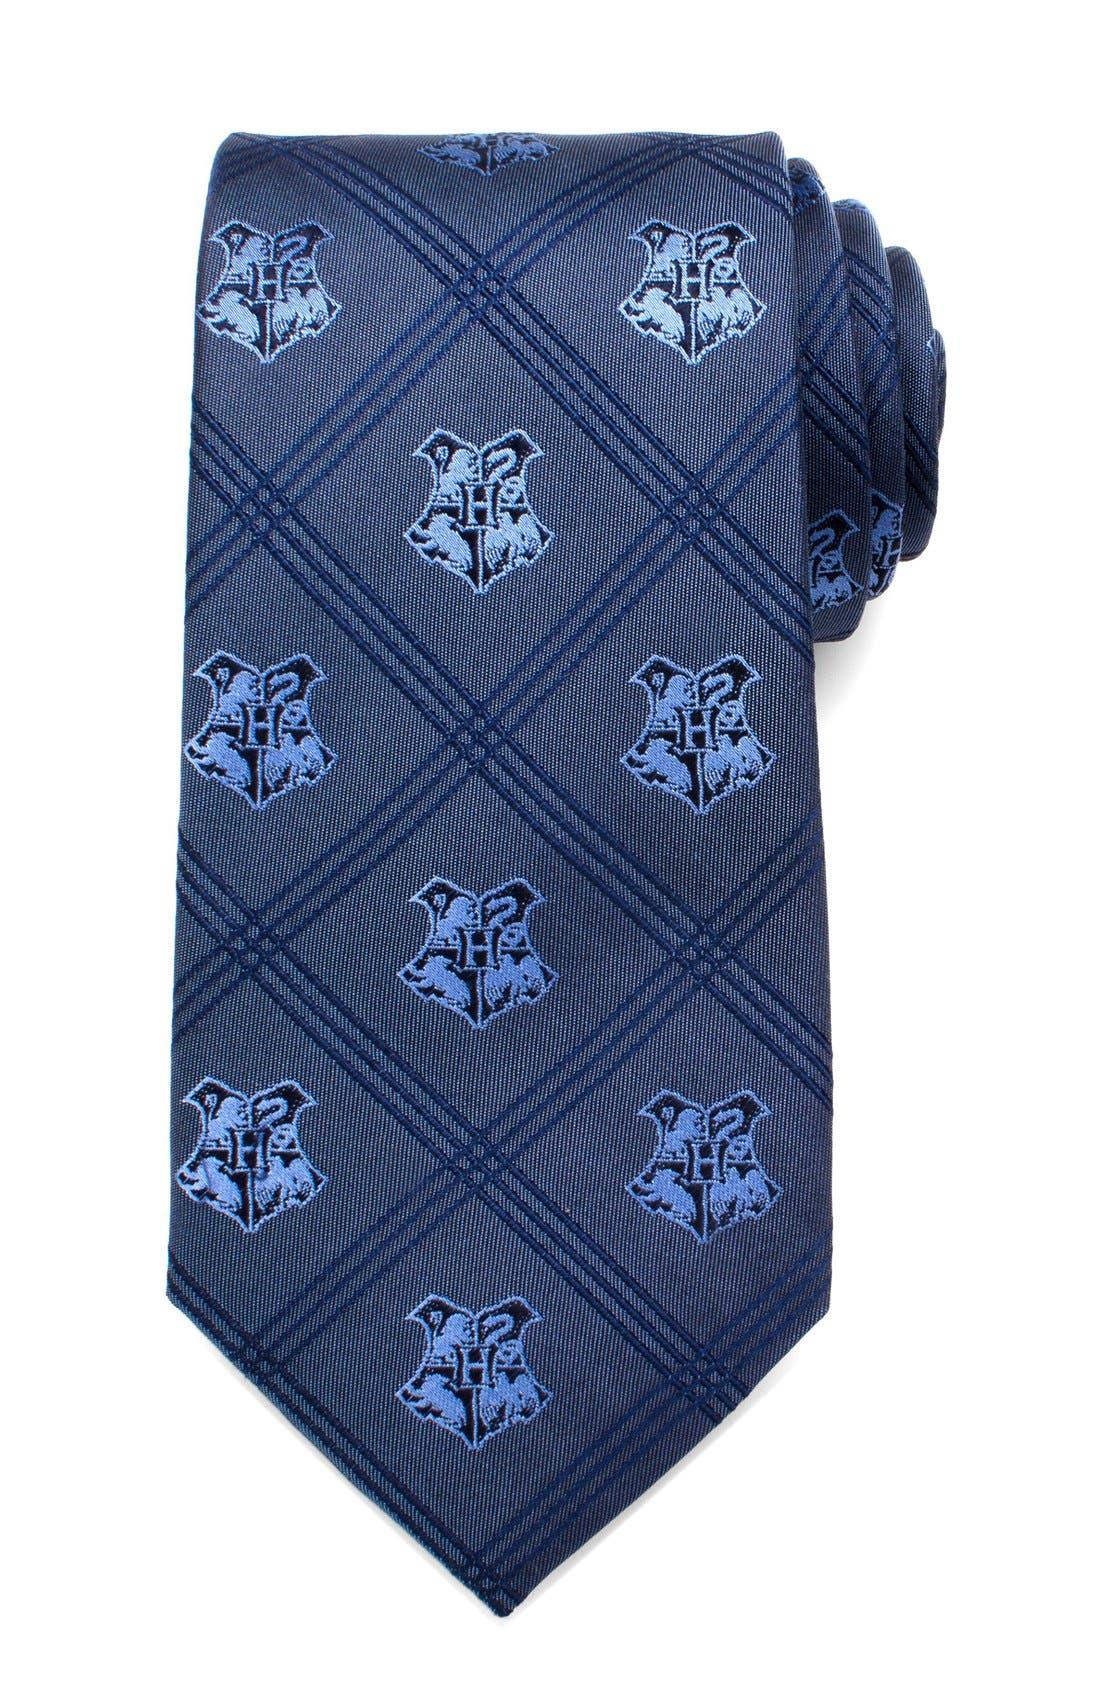 Cufflinks, Inc. 'Hogwarts' Silk Tie